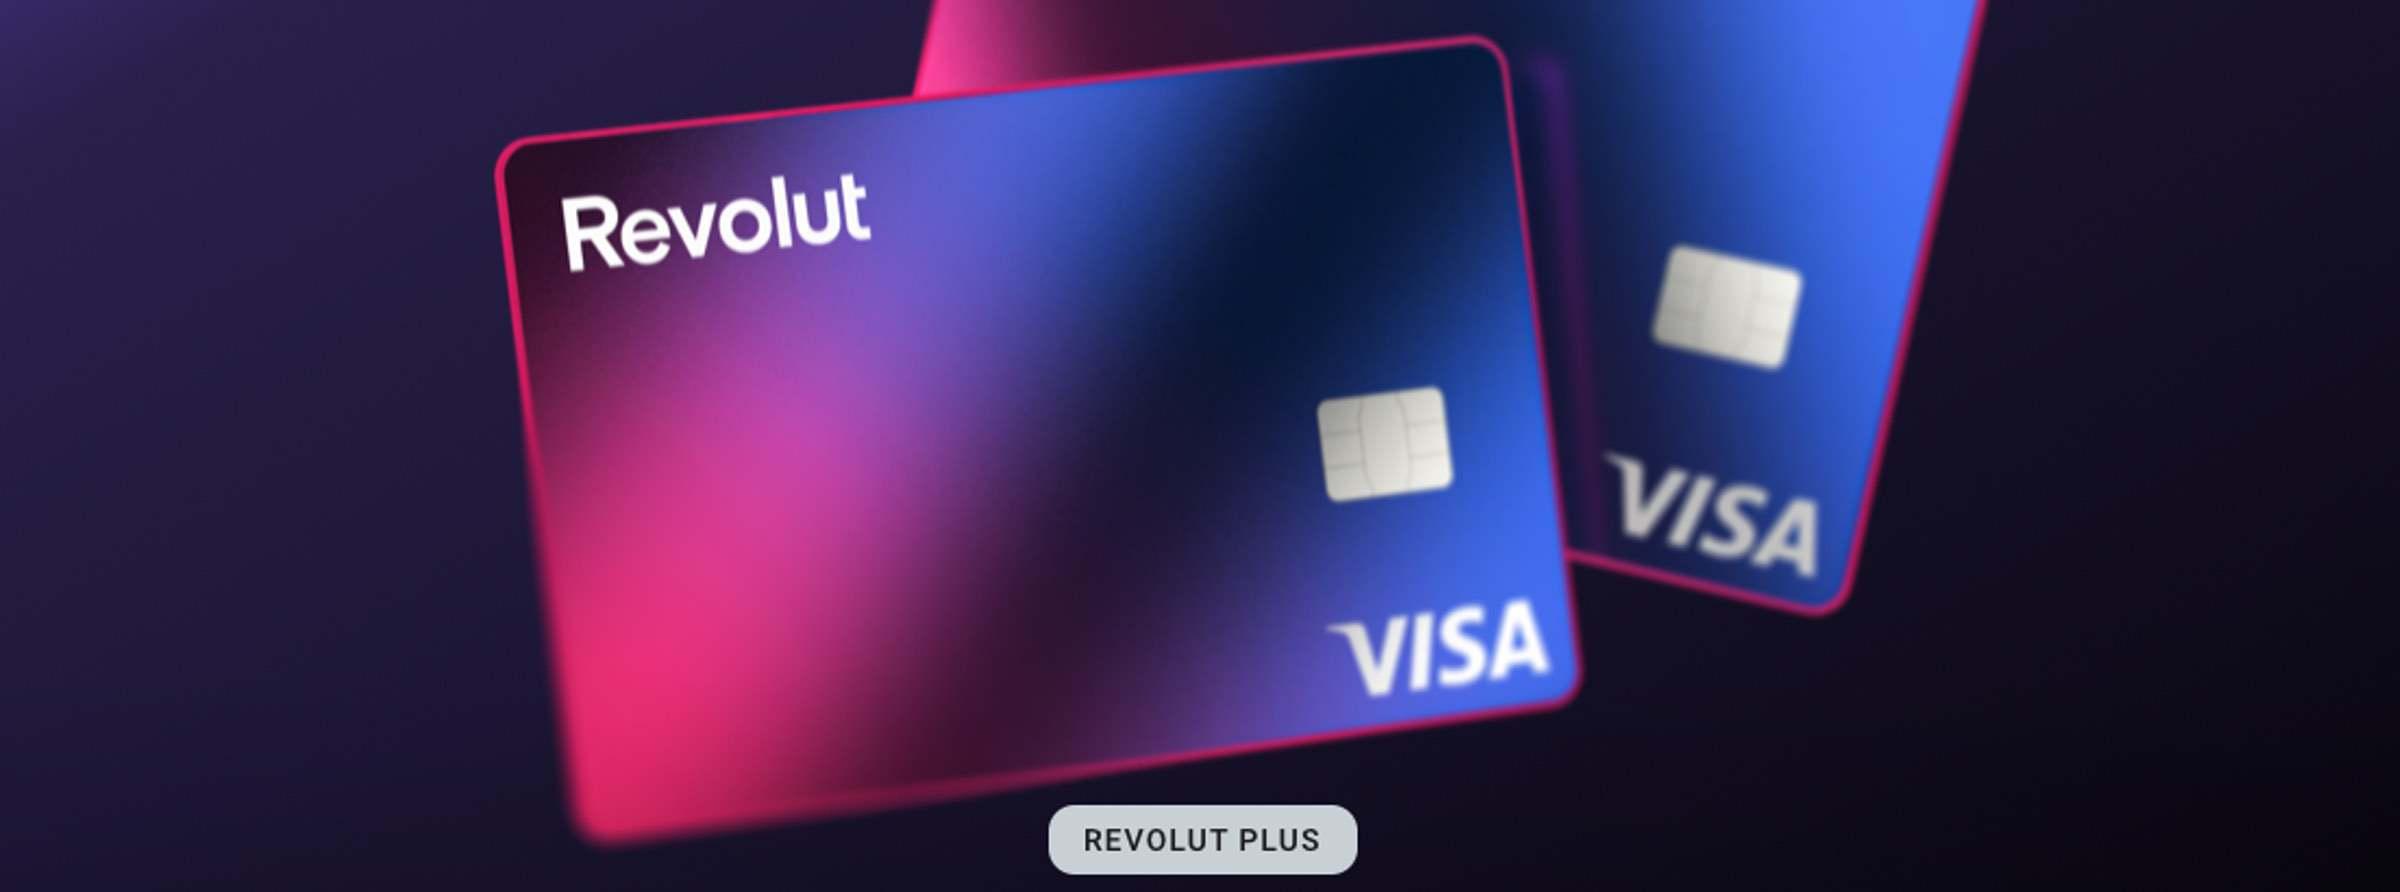 Revolut Plus – Günstigeres Konto mit Käuferschutz